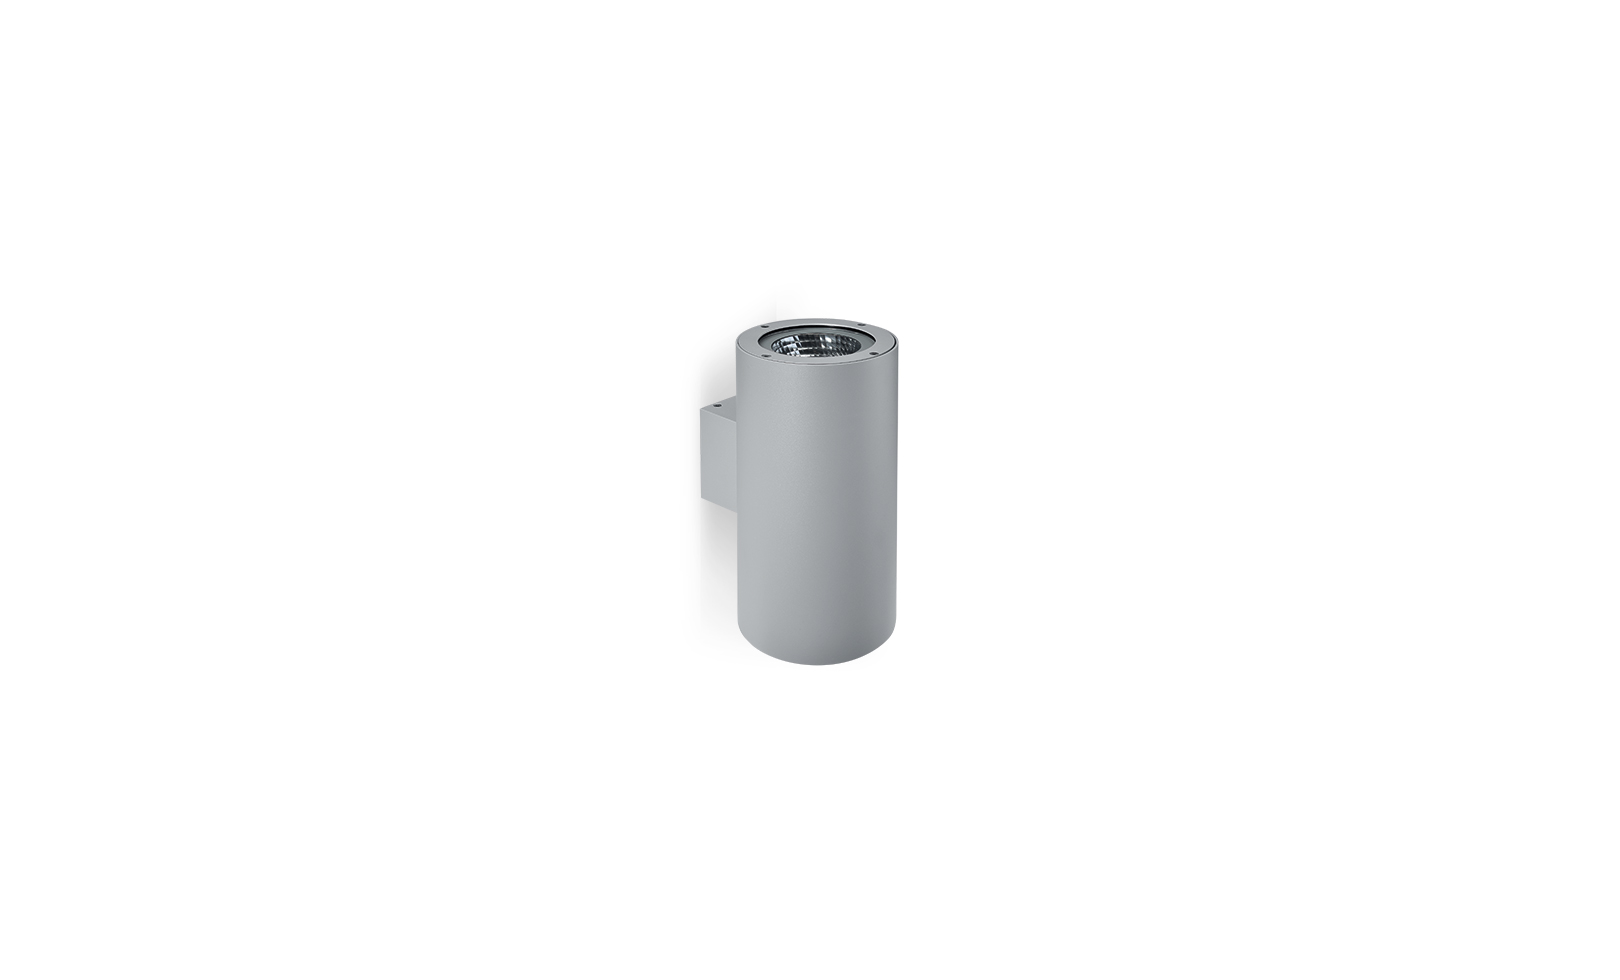 401010 TECH MAXI 02 ROUND LED 2x39W 2